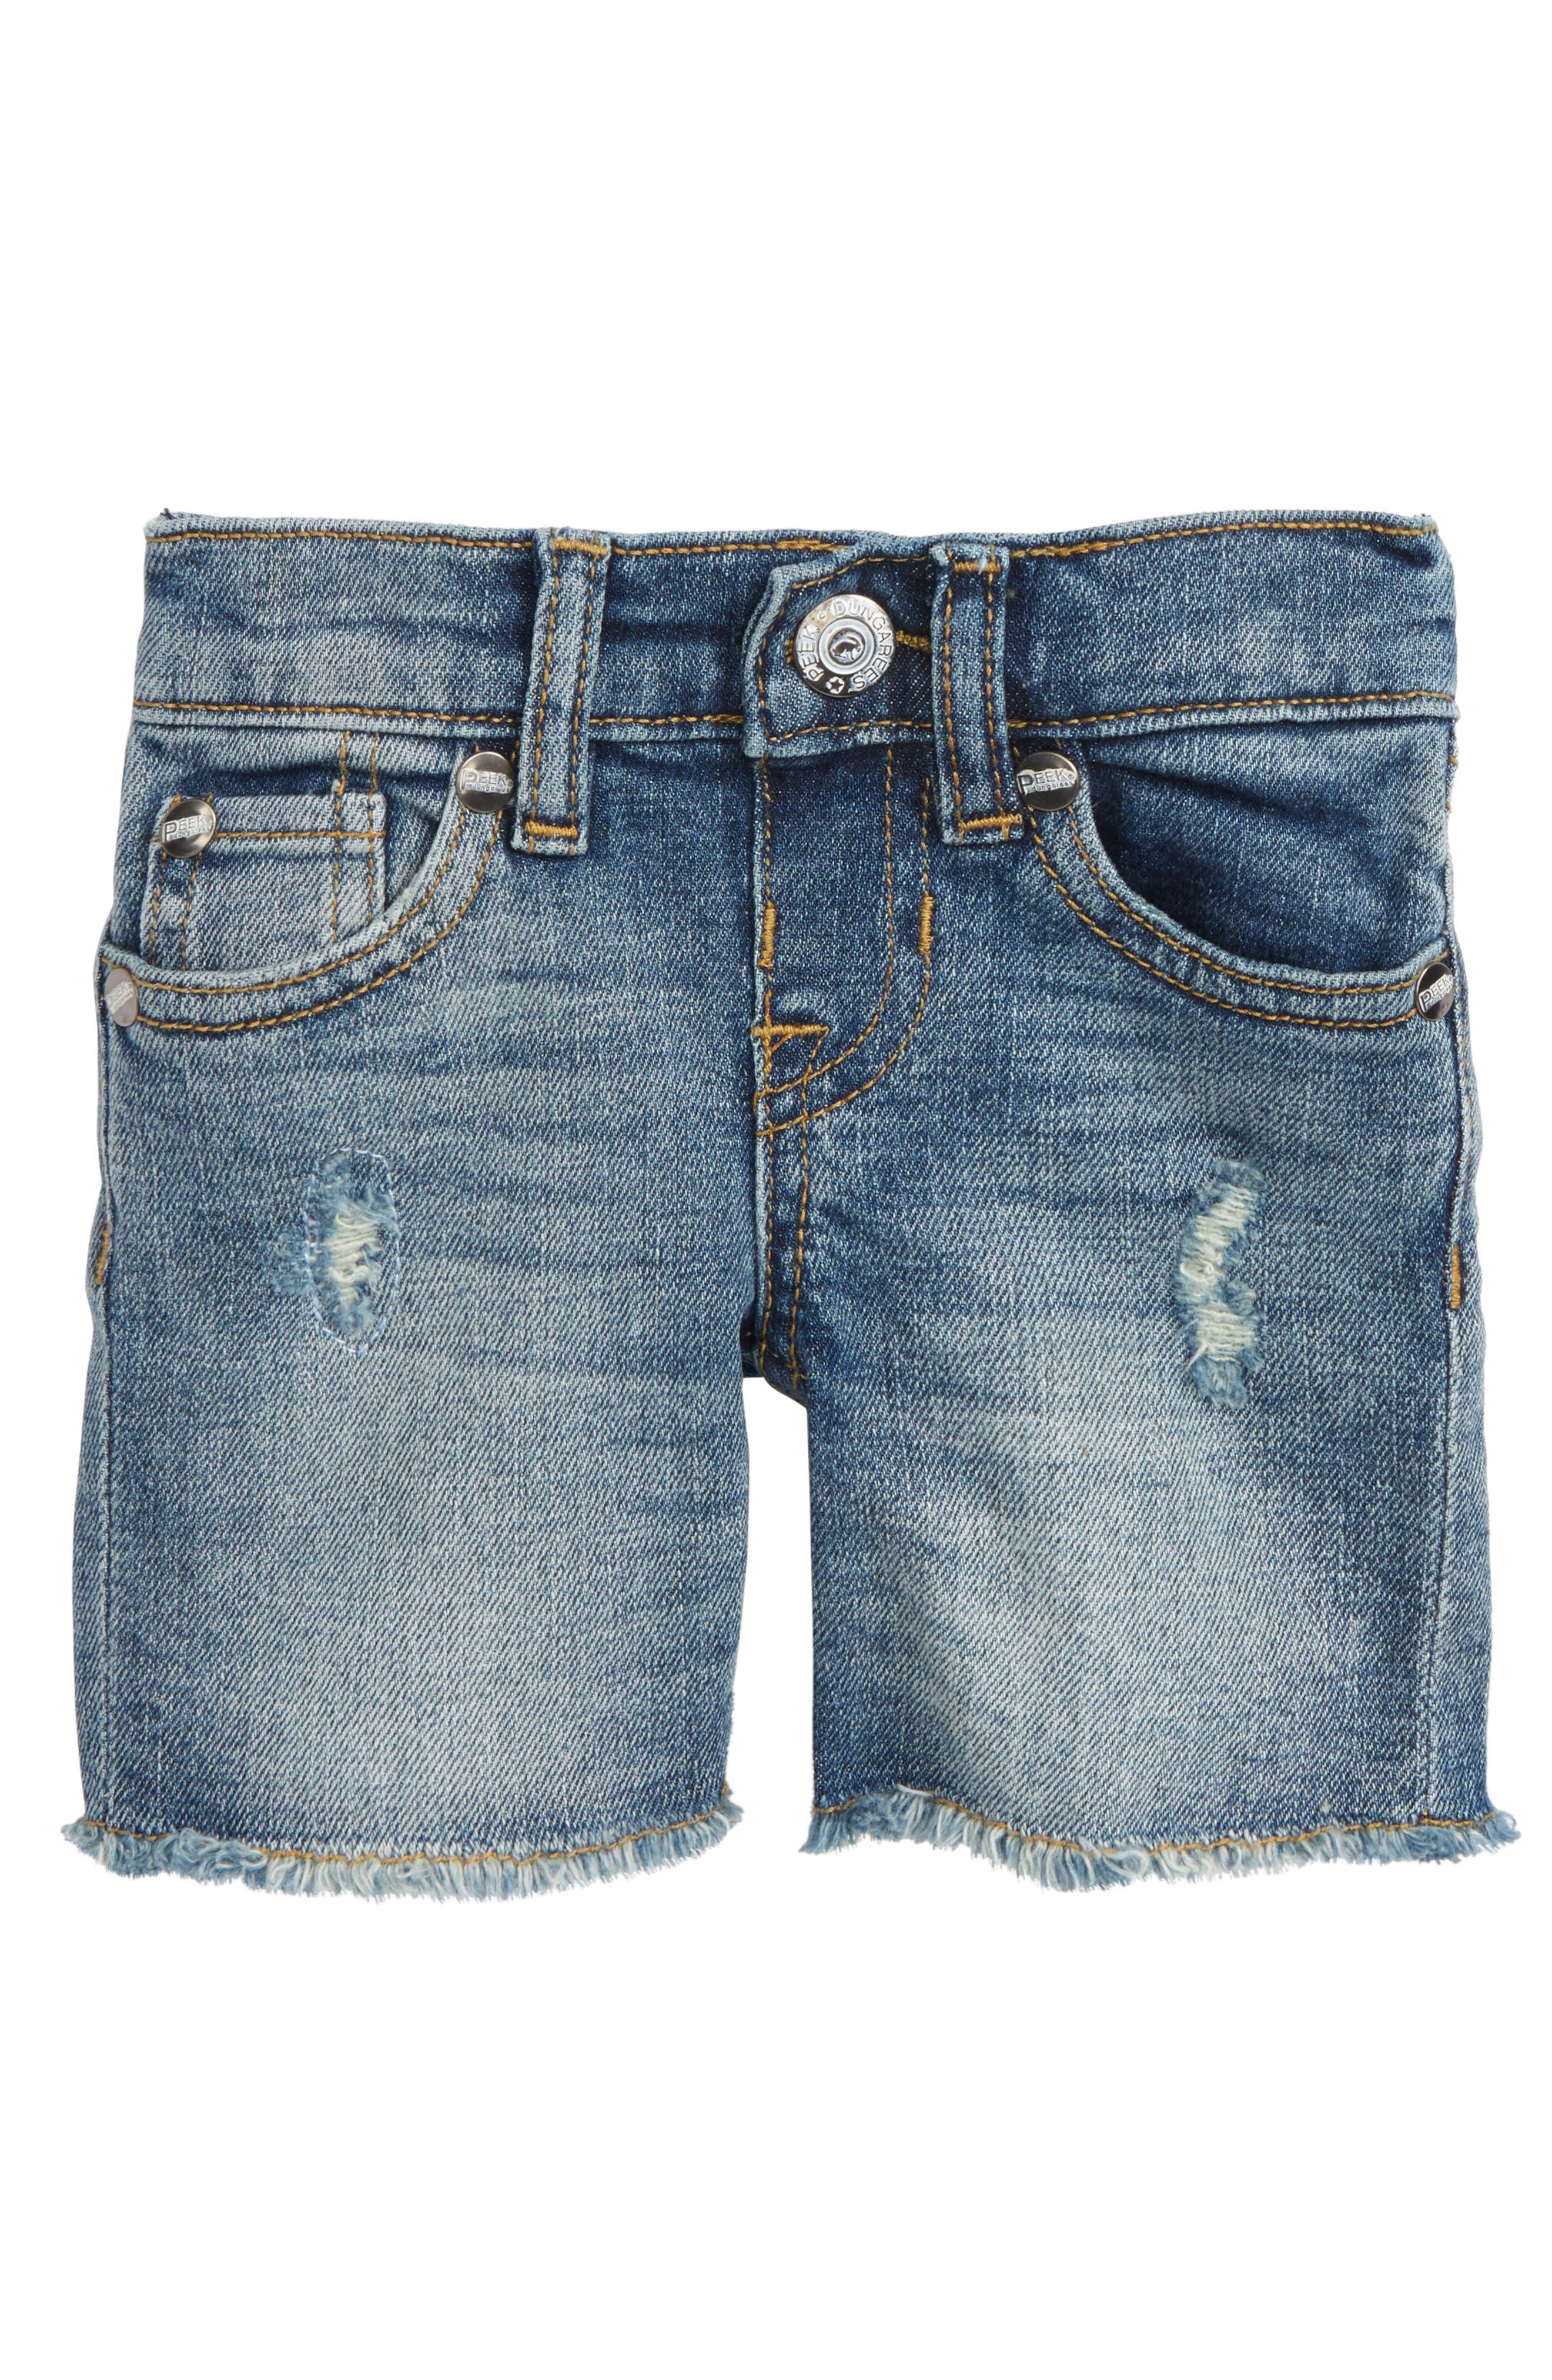 Fairfax Denim Shorts,                             Main thumbnail 1, color,                             400